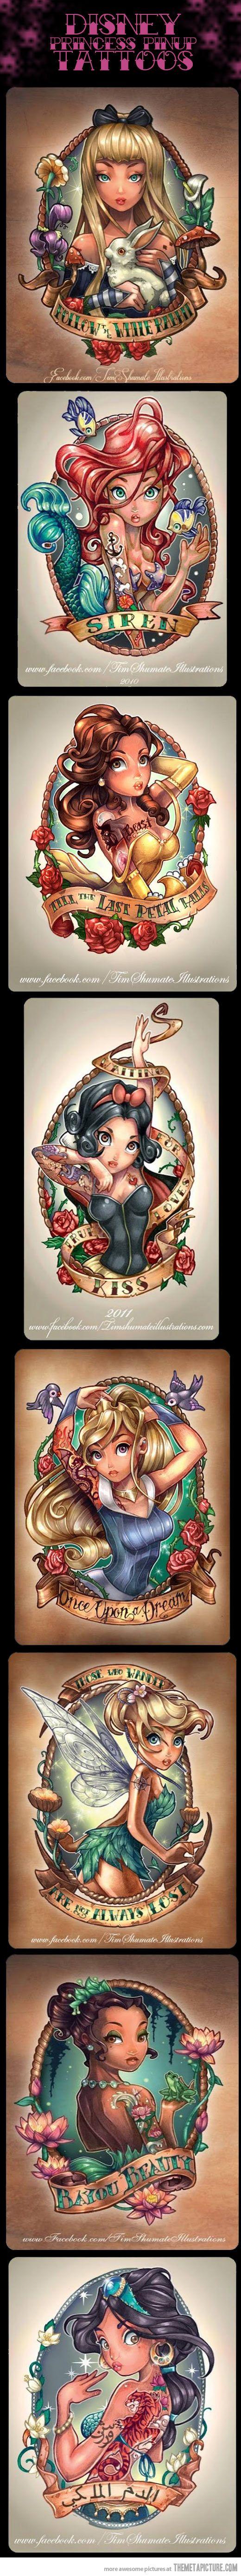 8 Very Cool Disney Princess Pinup Tattoos... - The Meta Picture